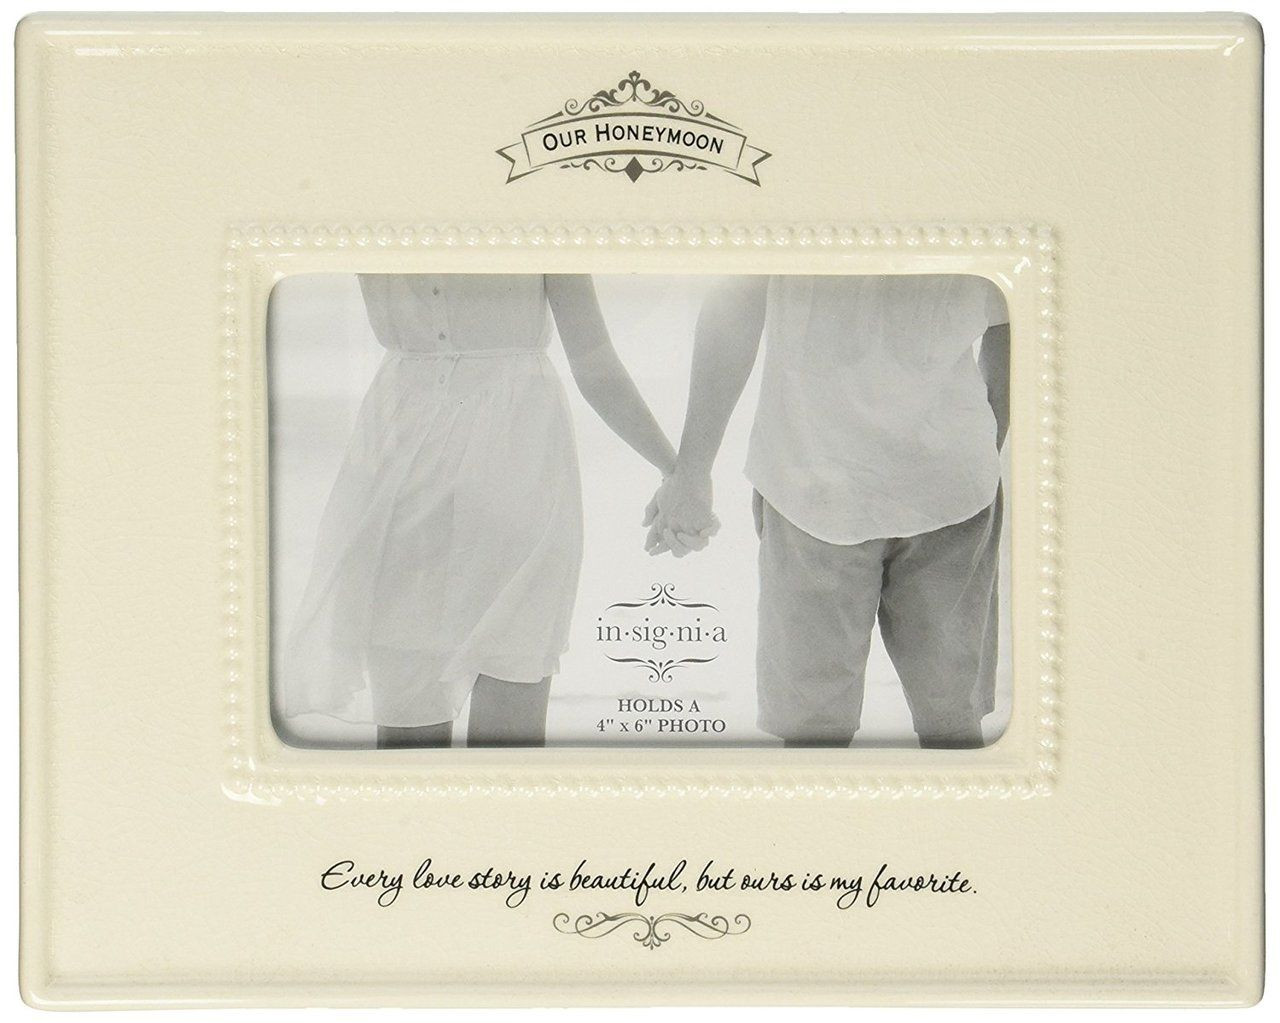 Insignia Honeymoon Photo Frame, 7.6 inches, Ivory - Bluebasilgifts.com